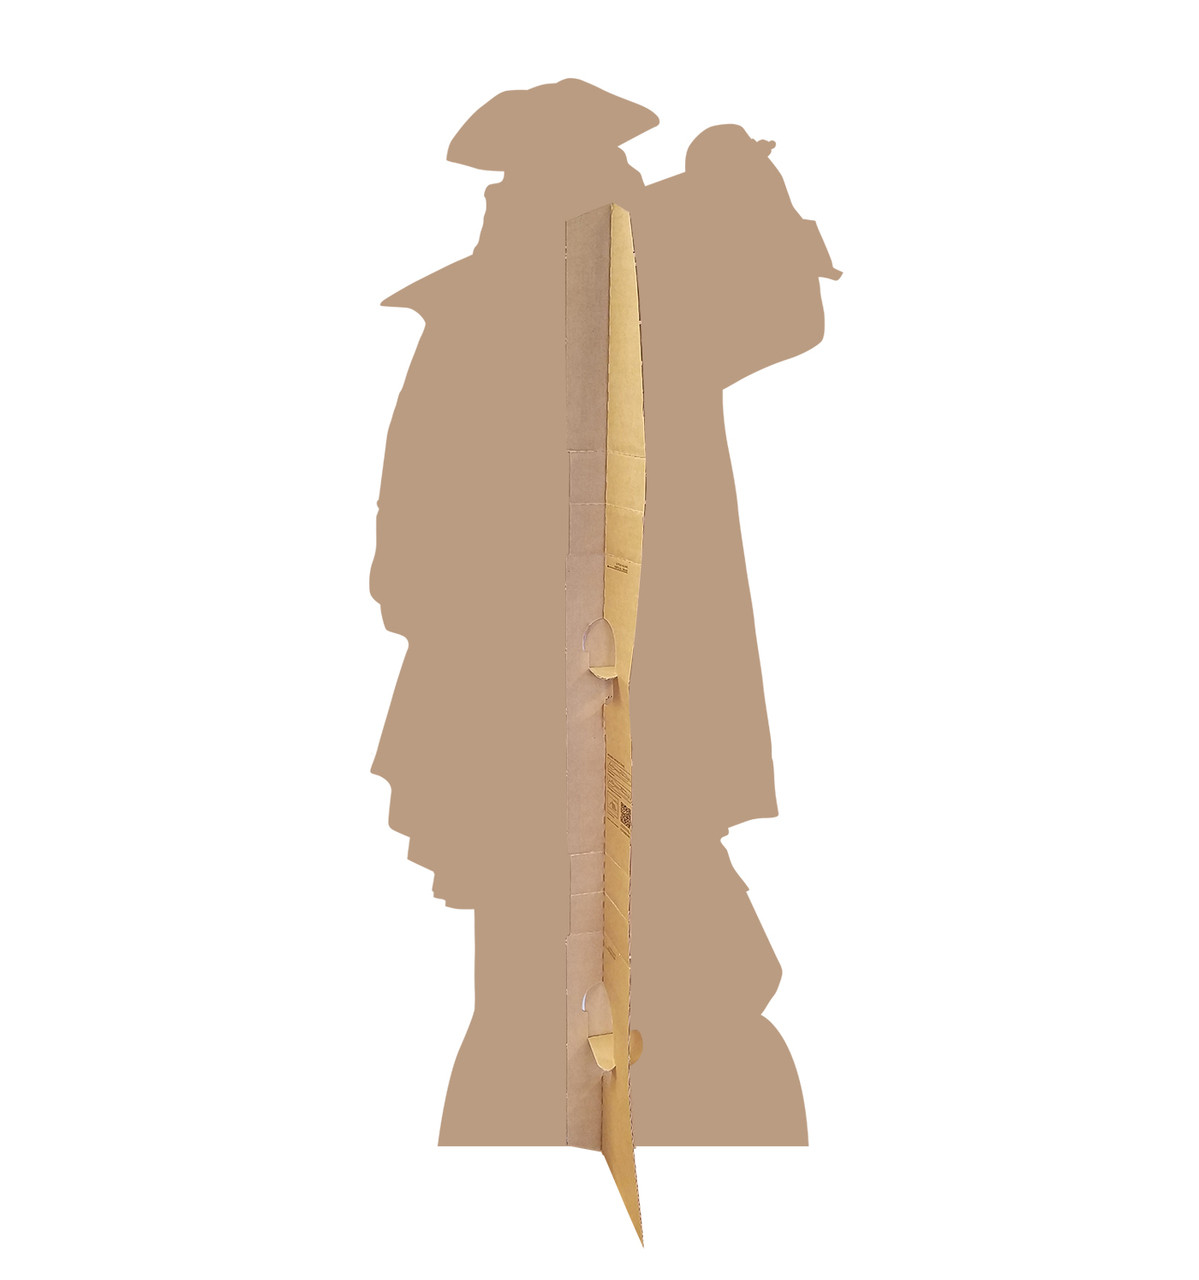 Life-size Jack Sparrow 02 (POTC 5) Cardboard Standup